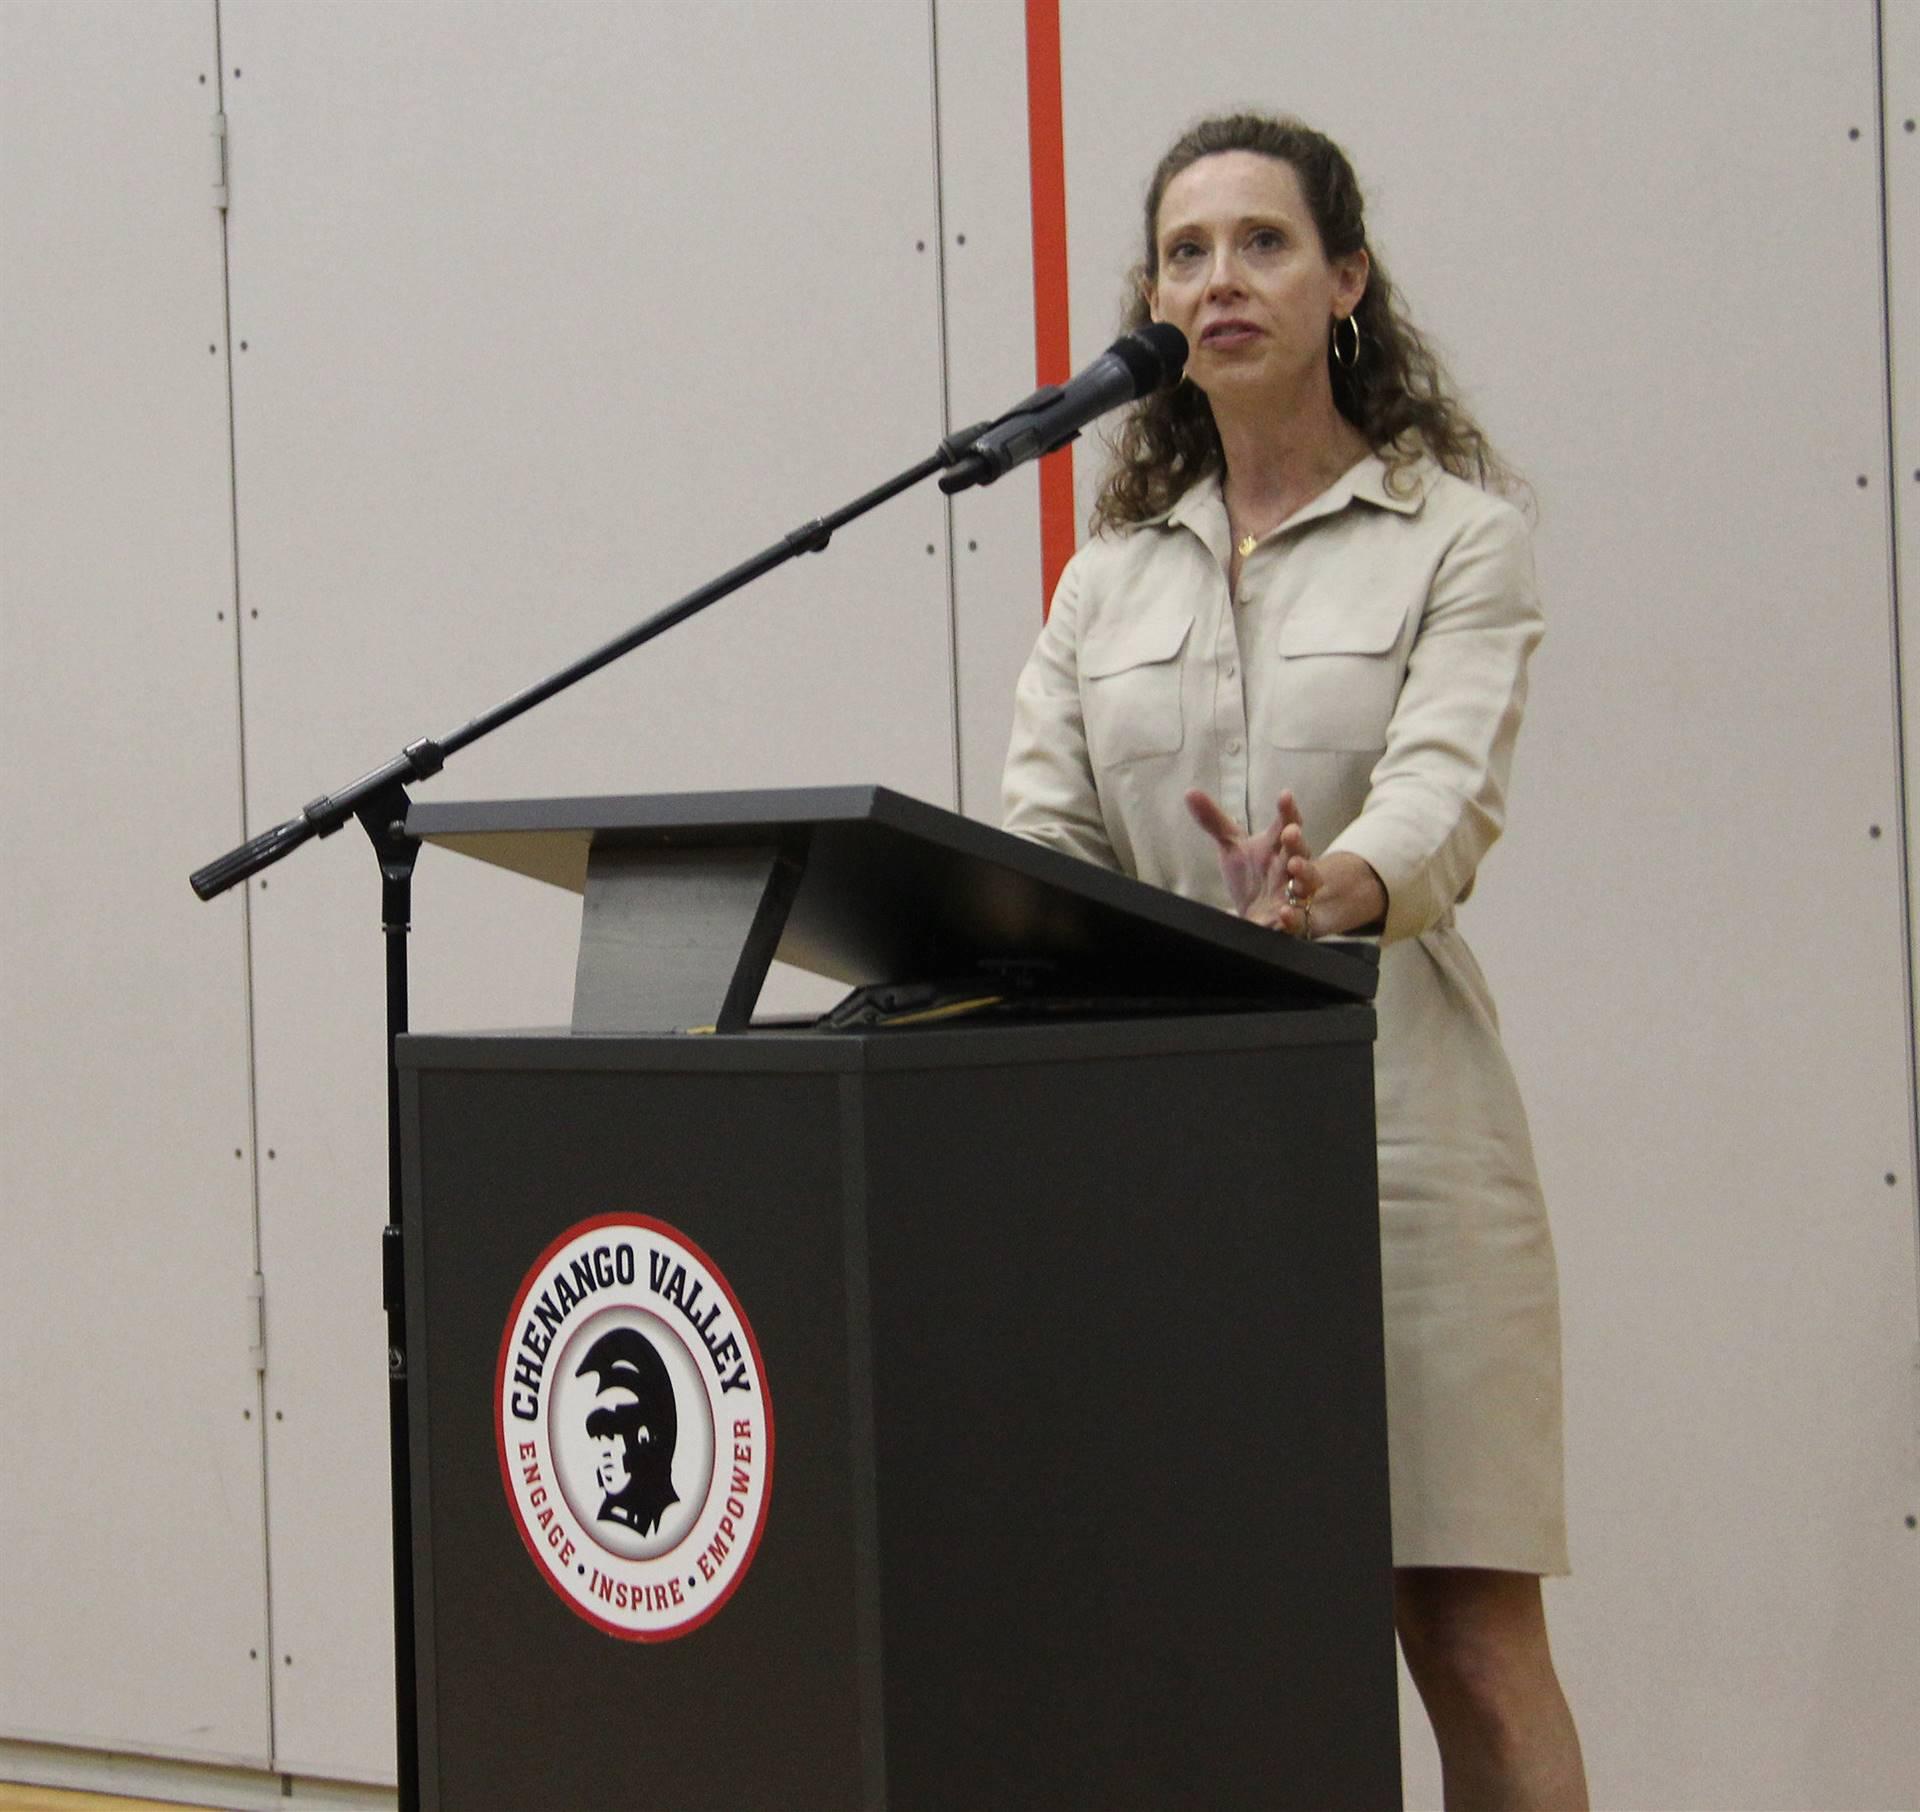 Chenango Valley Athletic Club President Speaking